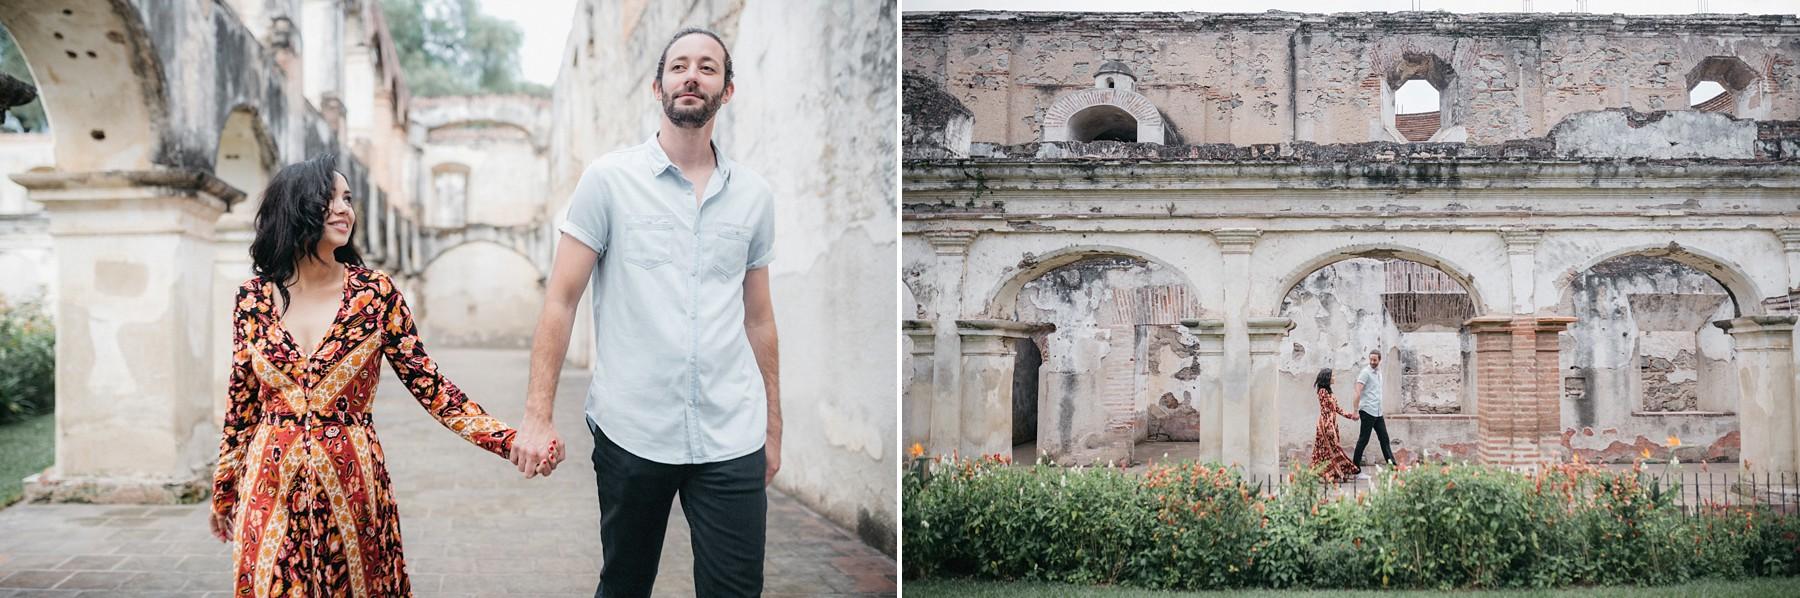 Wedding Photographer Guatemala